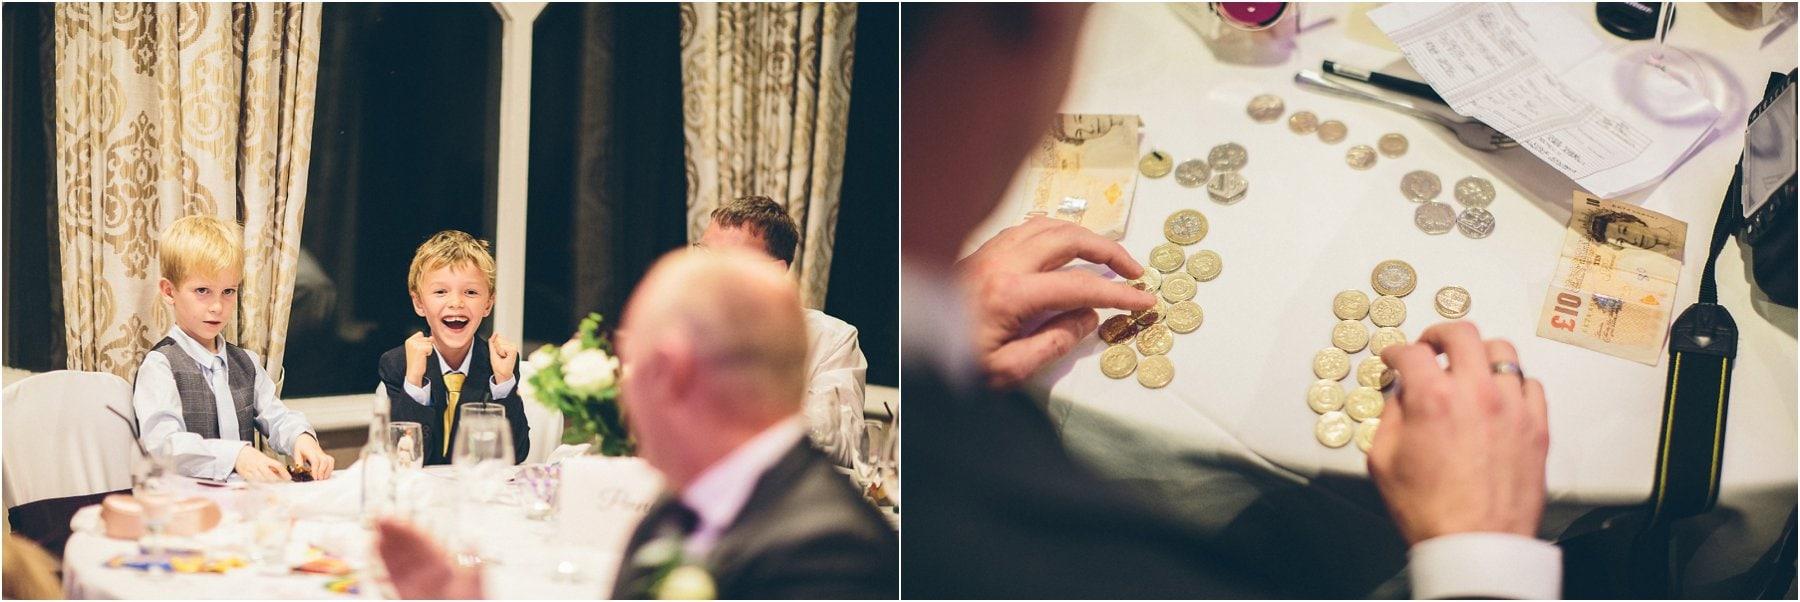 Crabwall_Manor_Wedding_Photography_0092